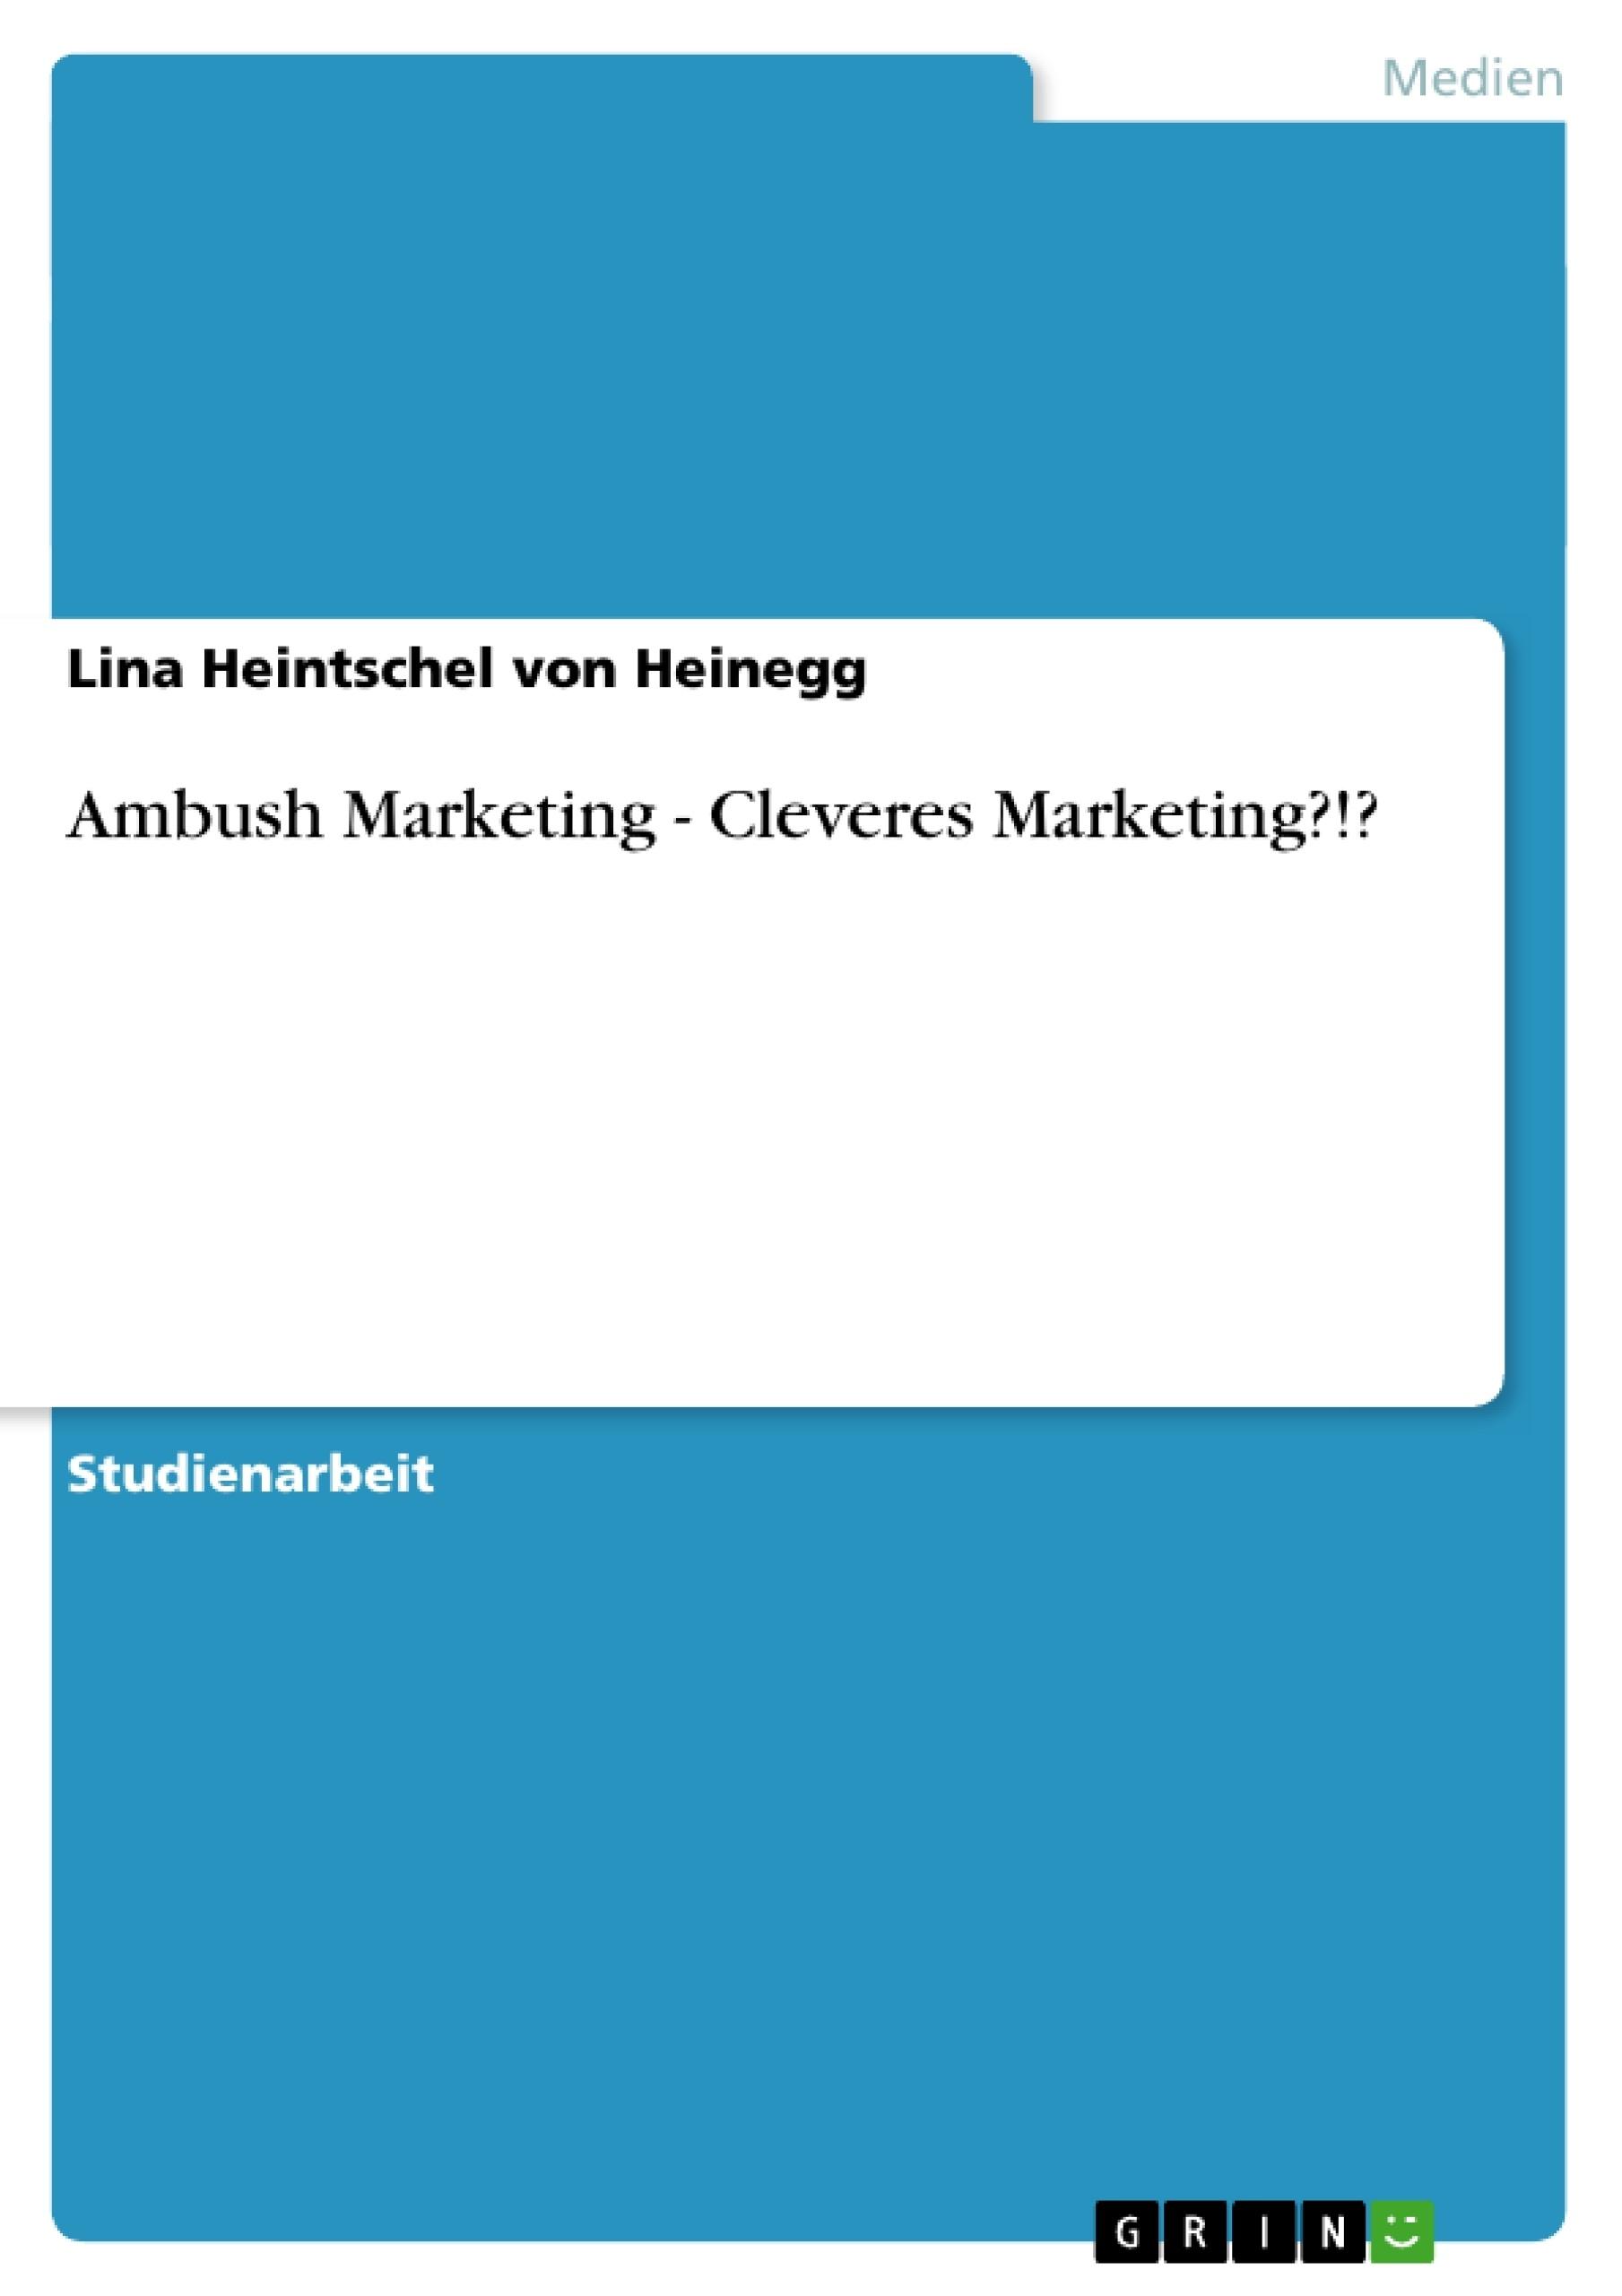 Titel: Ambush Marketing - Cleveres Marketing?!?